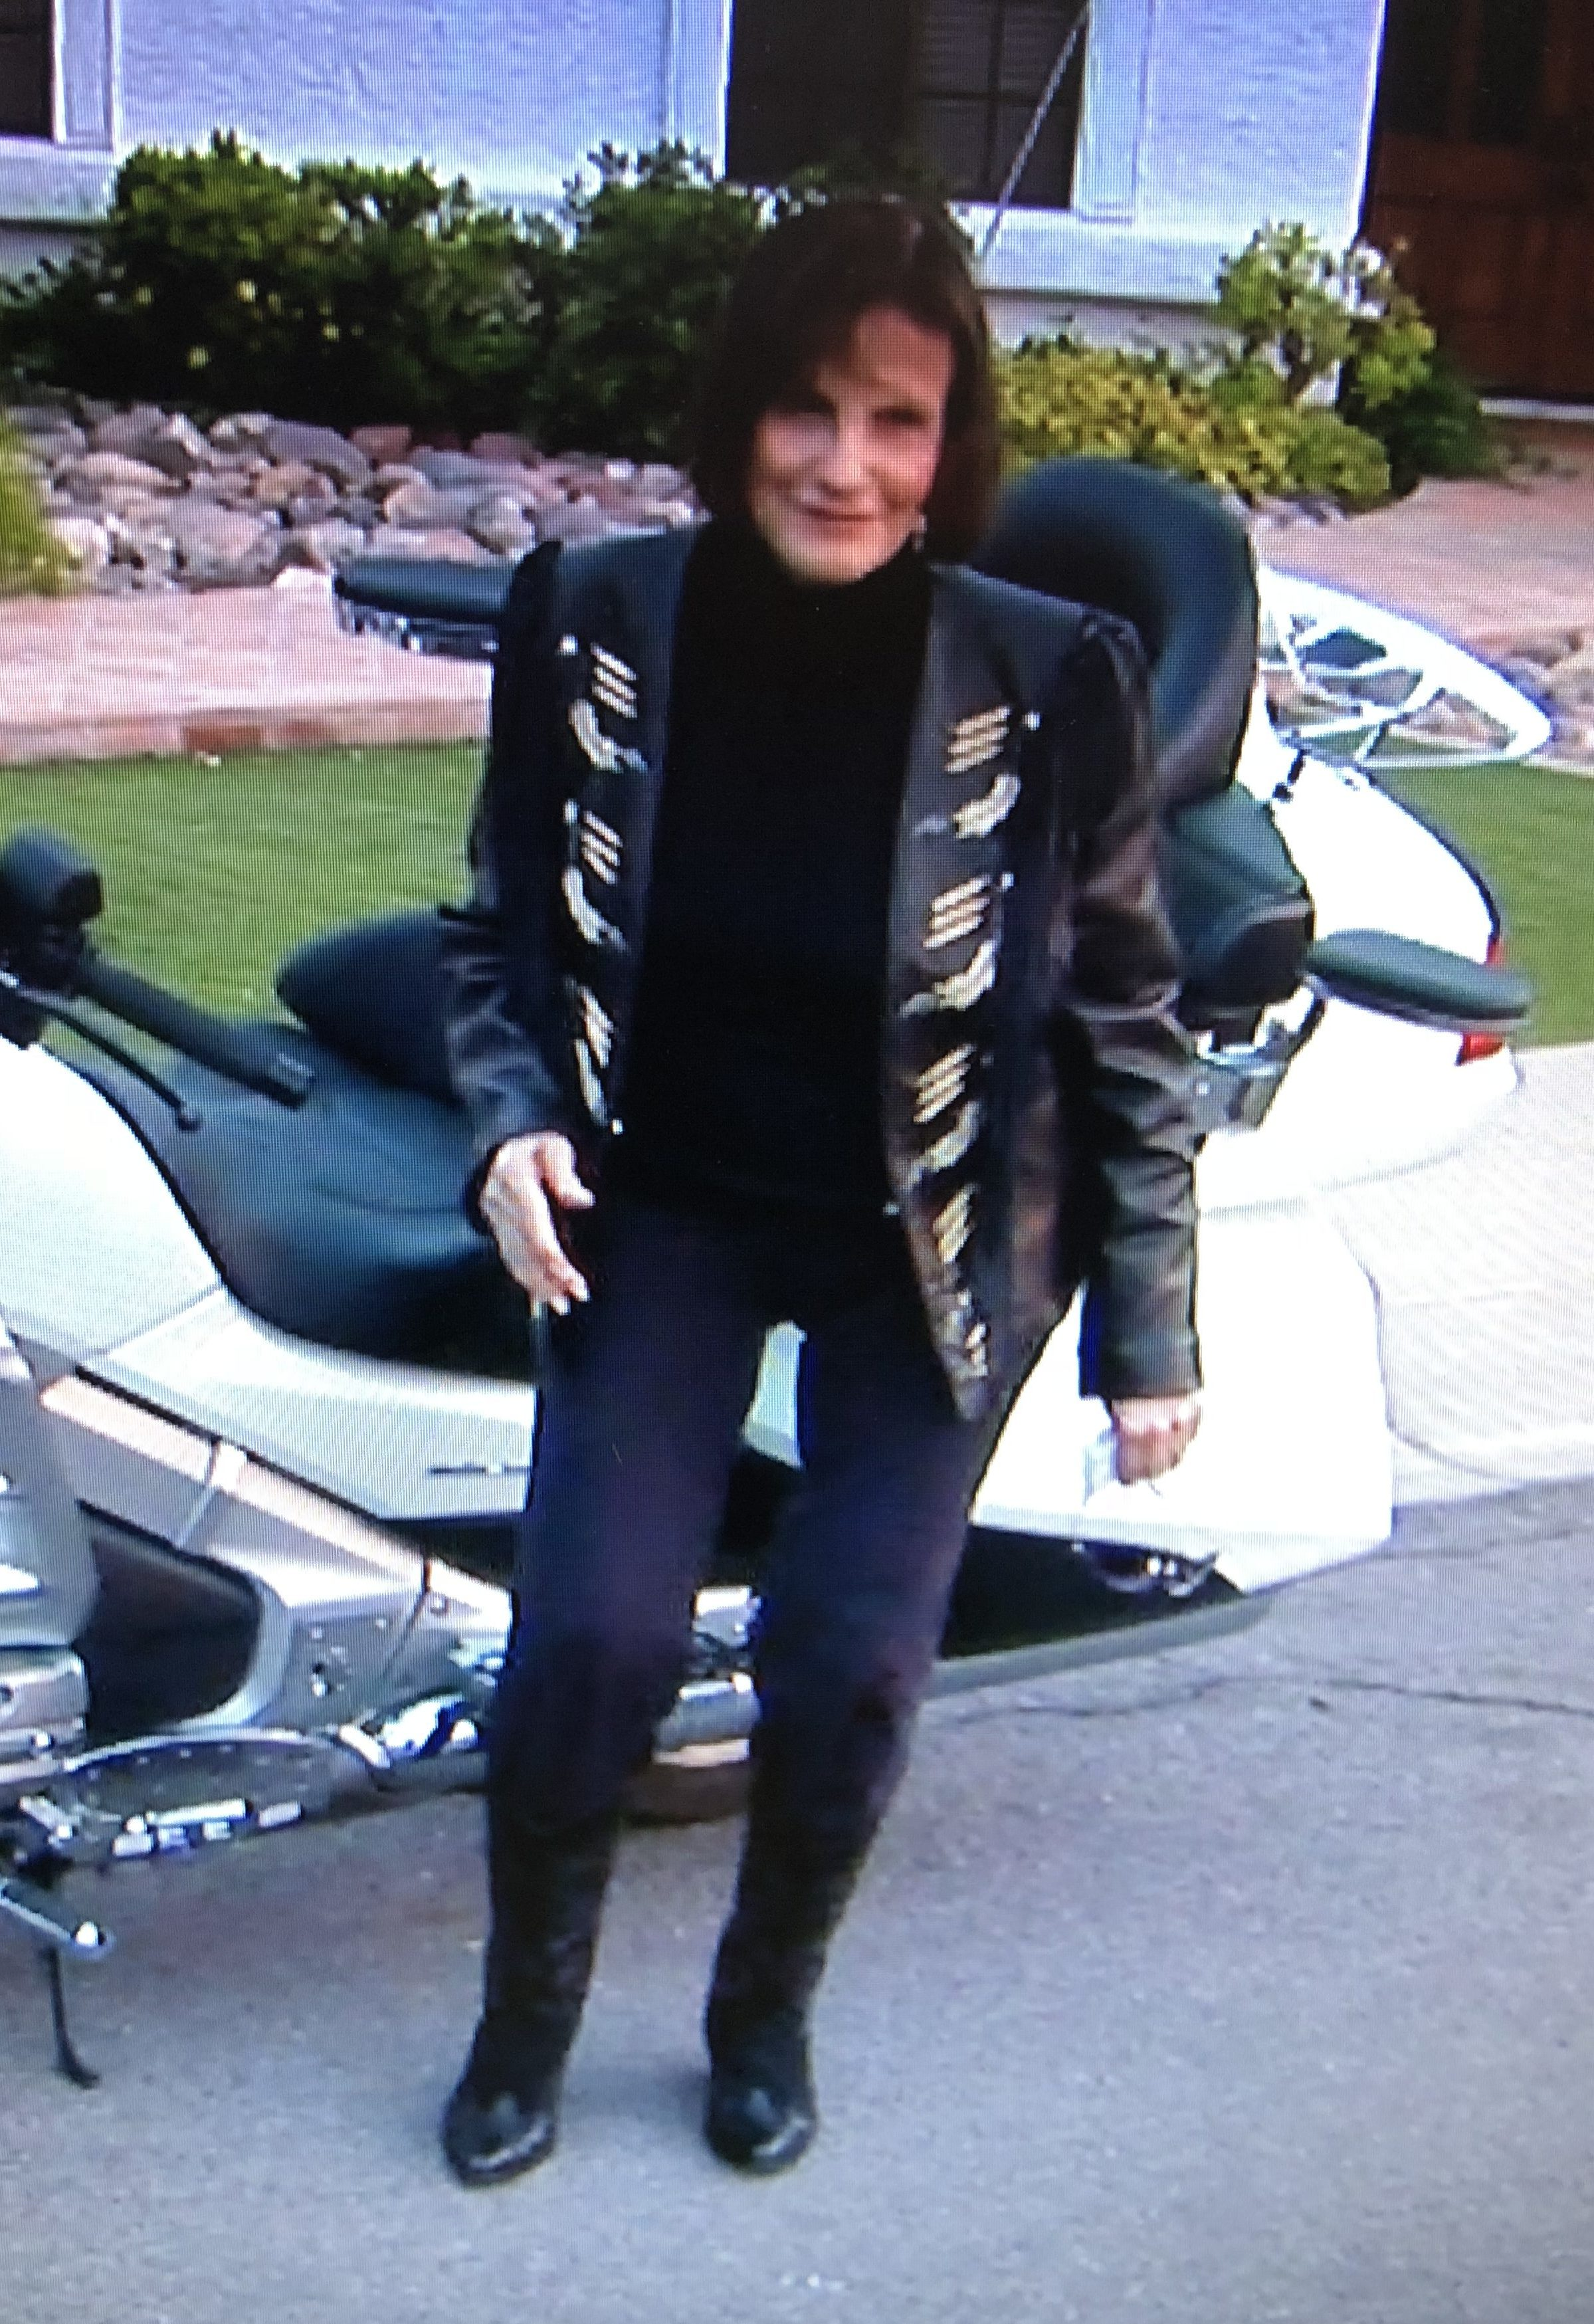 Daisy Monzo in 2012